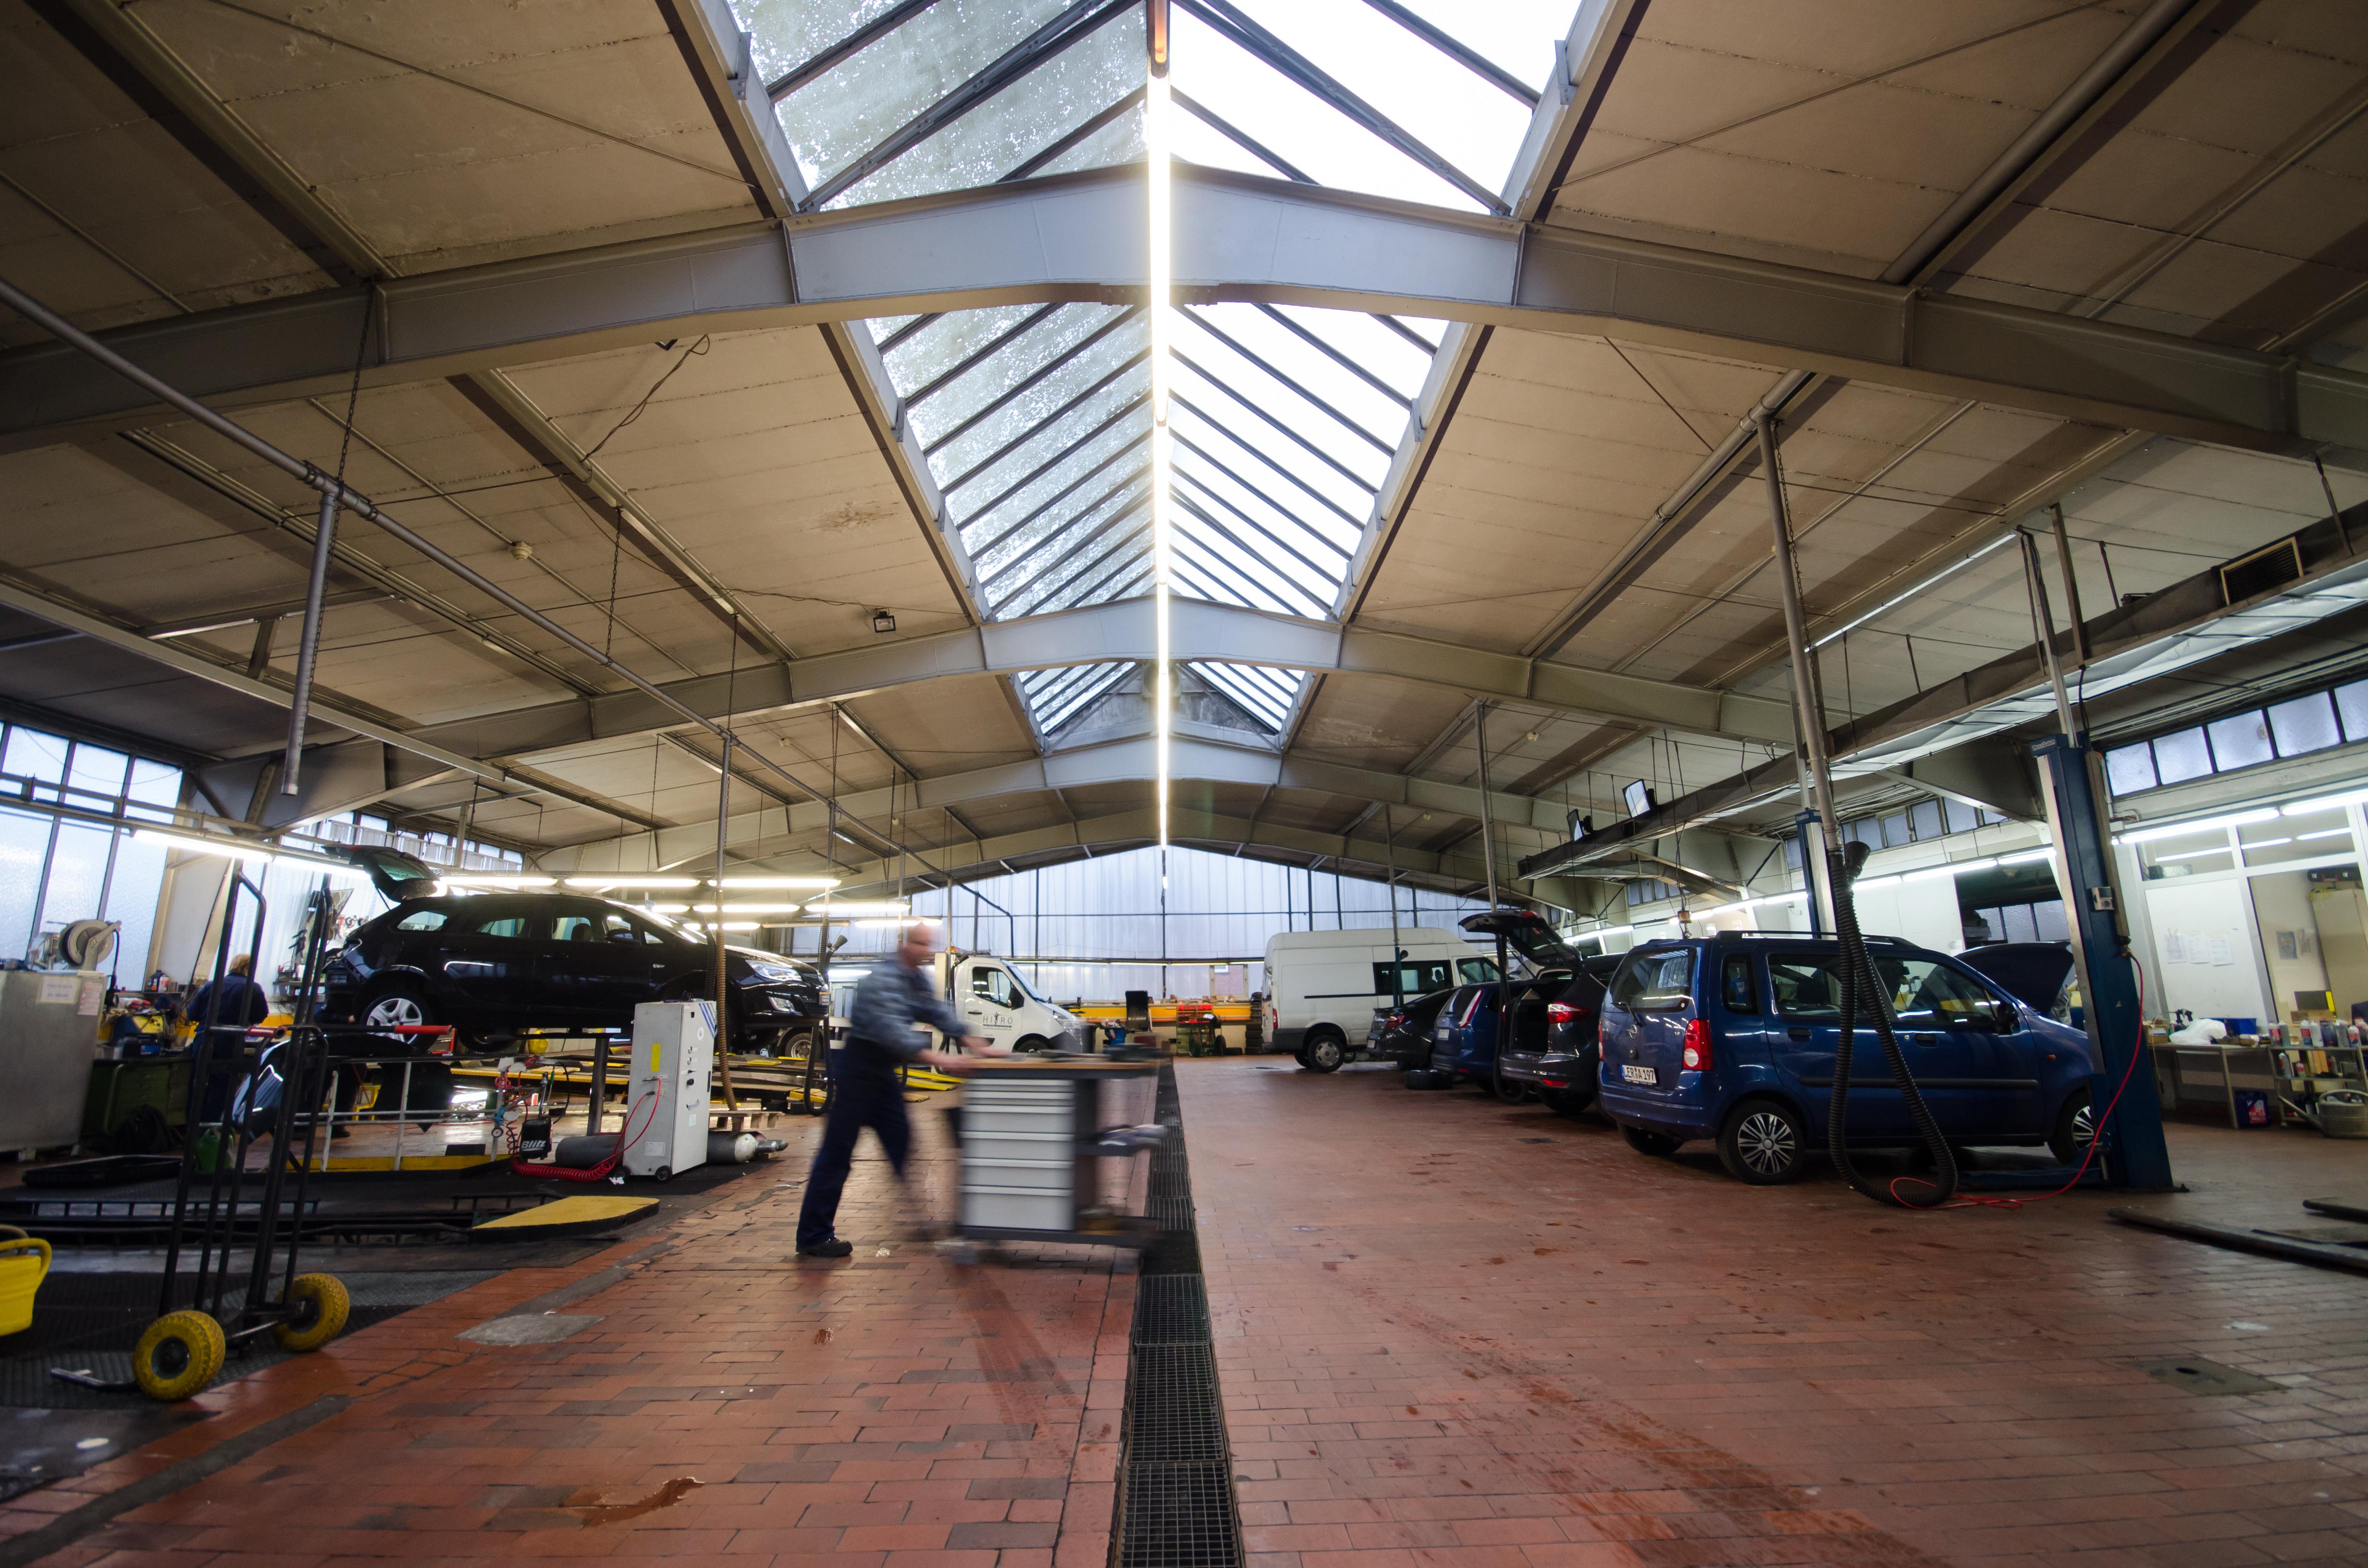 DSC_8998.jpg – HIRO Automarkt GmbH